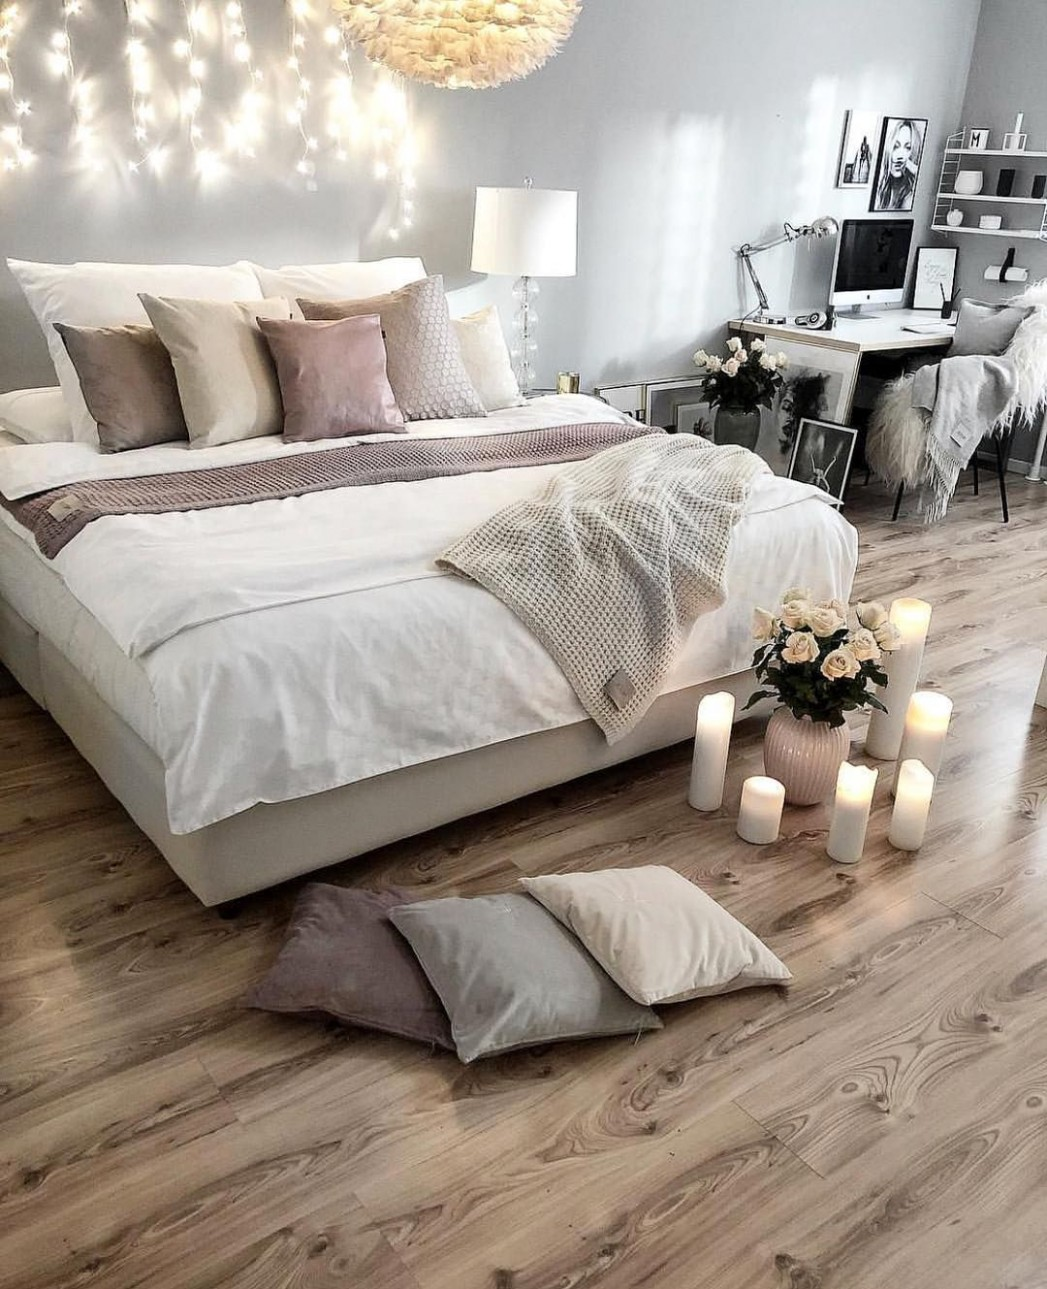 ❤️ Dreamy bedrooms on Instagram • photo © @easyinterieur  - Bedroom Ideas Instagram